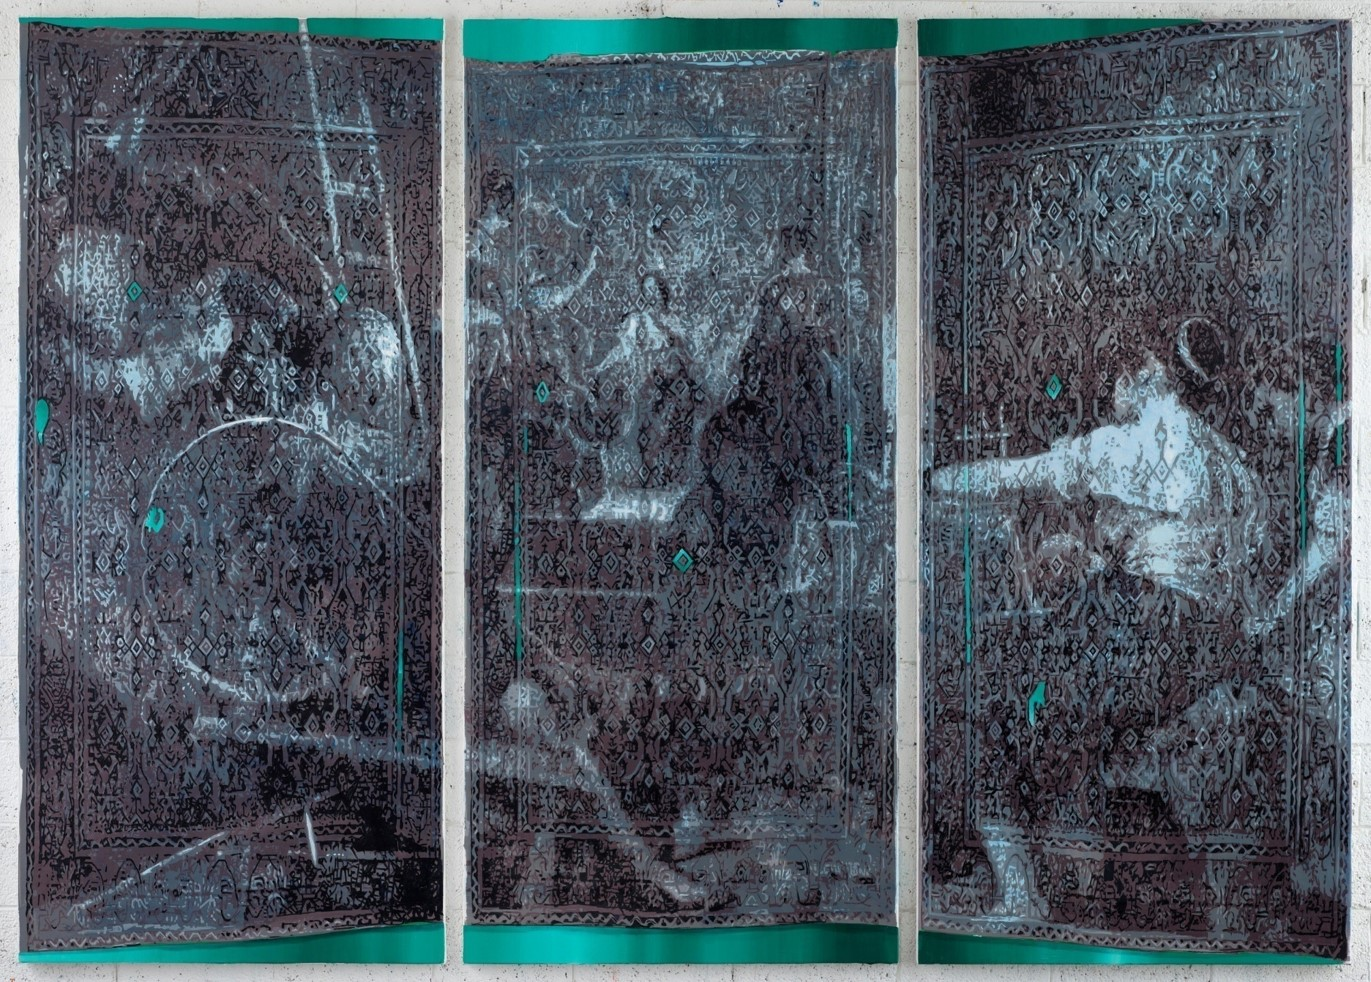 Oren Eliav, Loom, 2018, triptych, oil on canvas, 240 x 110 cm, each panel